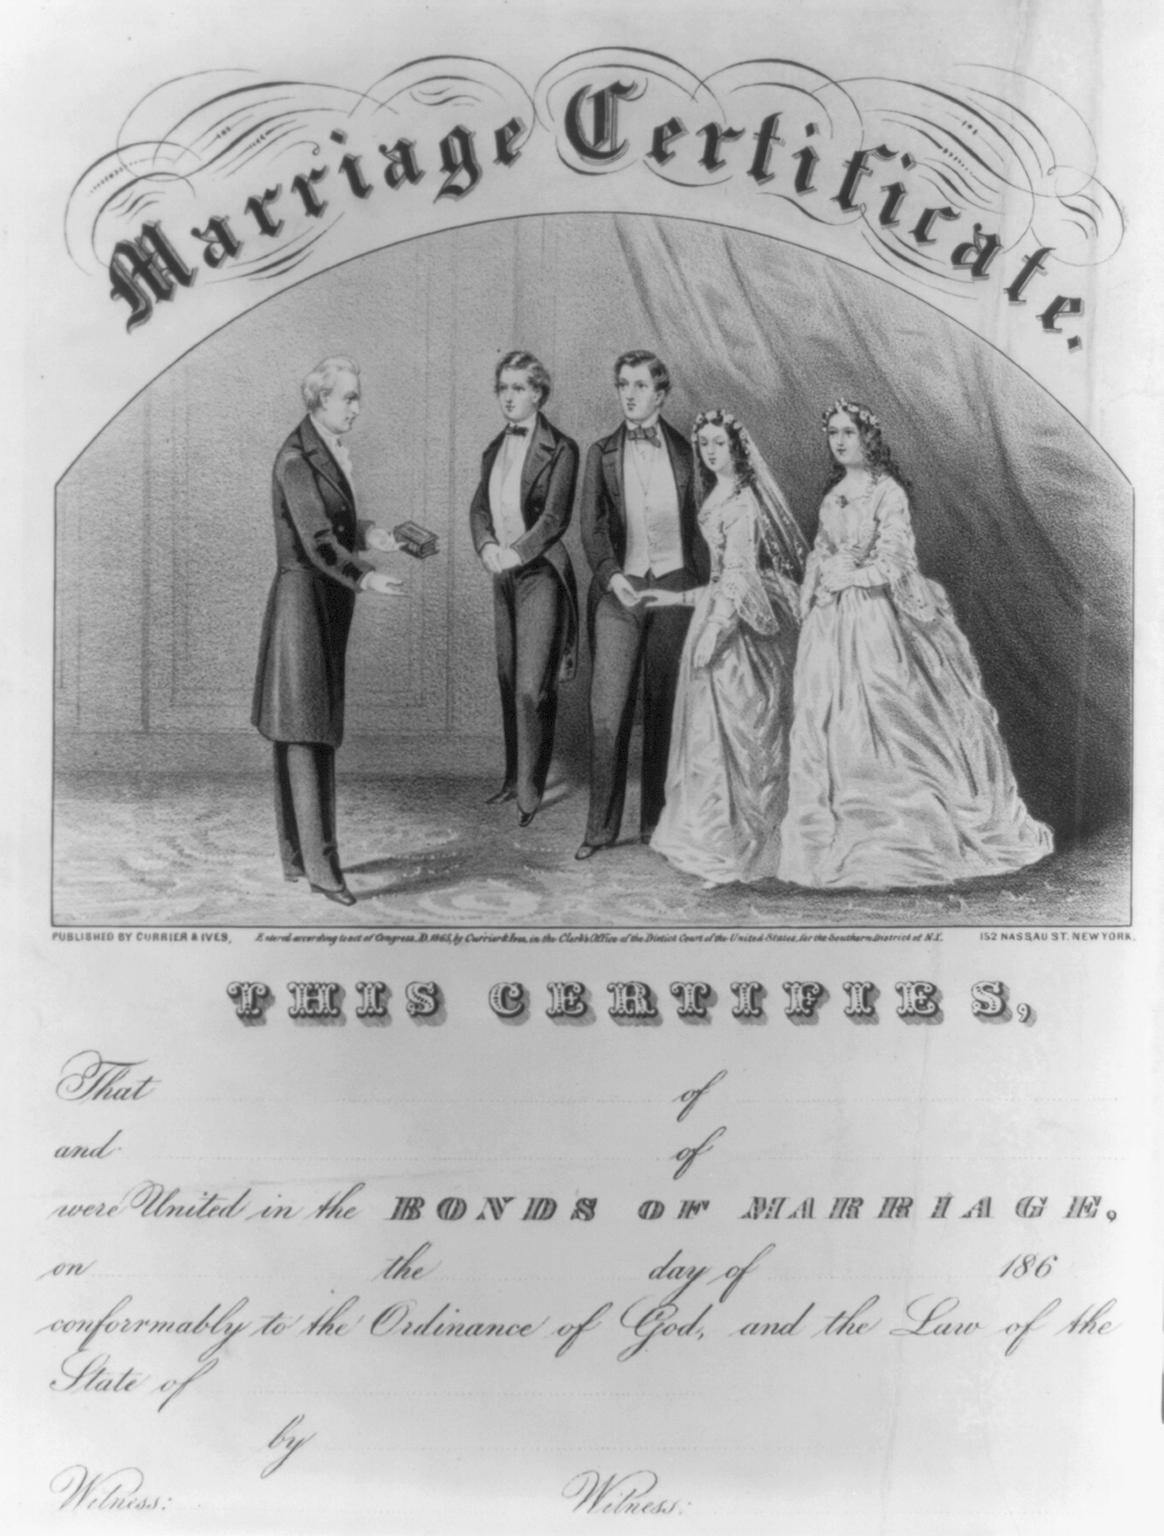 Filemarriage Certificateg Wikimedia Commons